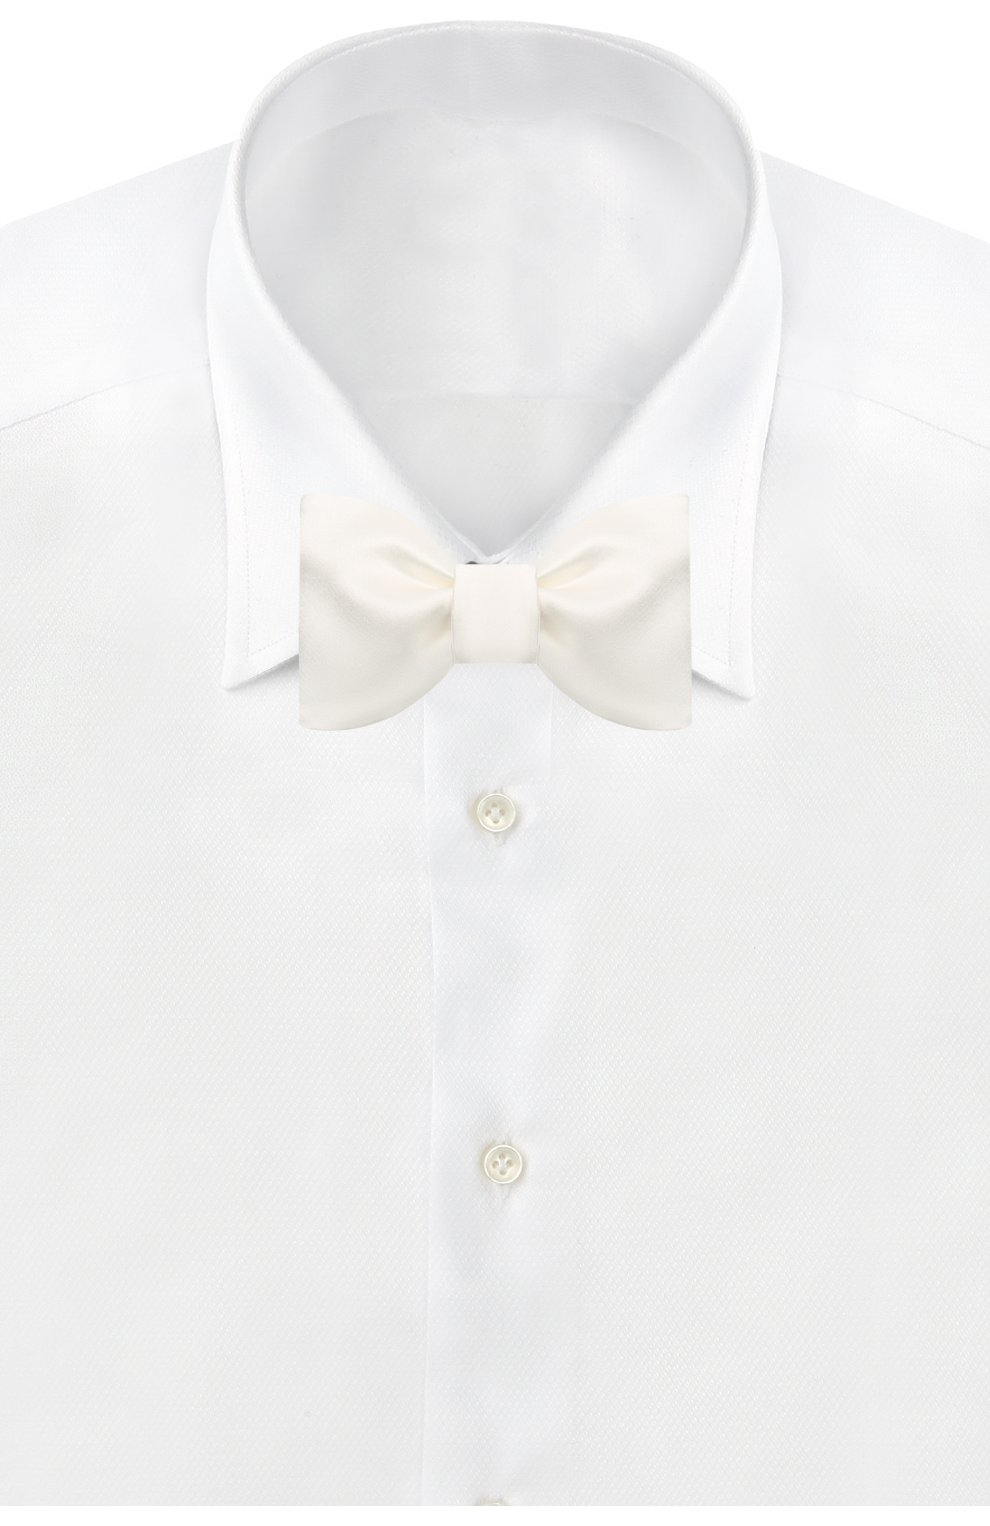 Мужской галстук-бабочка из хлопка и шелка BRUNELLO CUCINELLI белого цвета, арт. MR8130003 | Фото 2